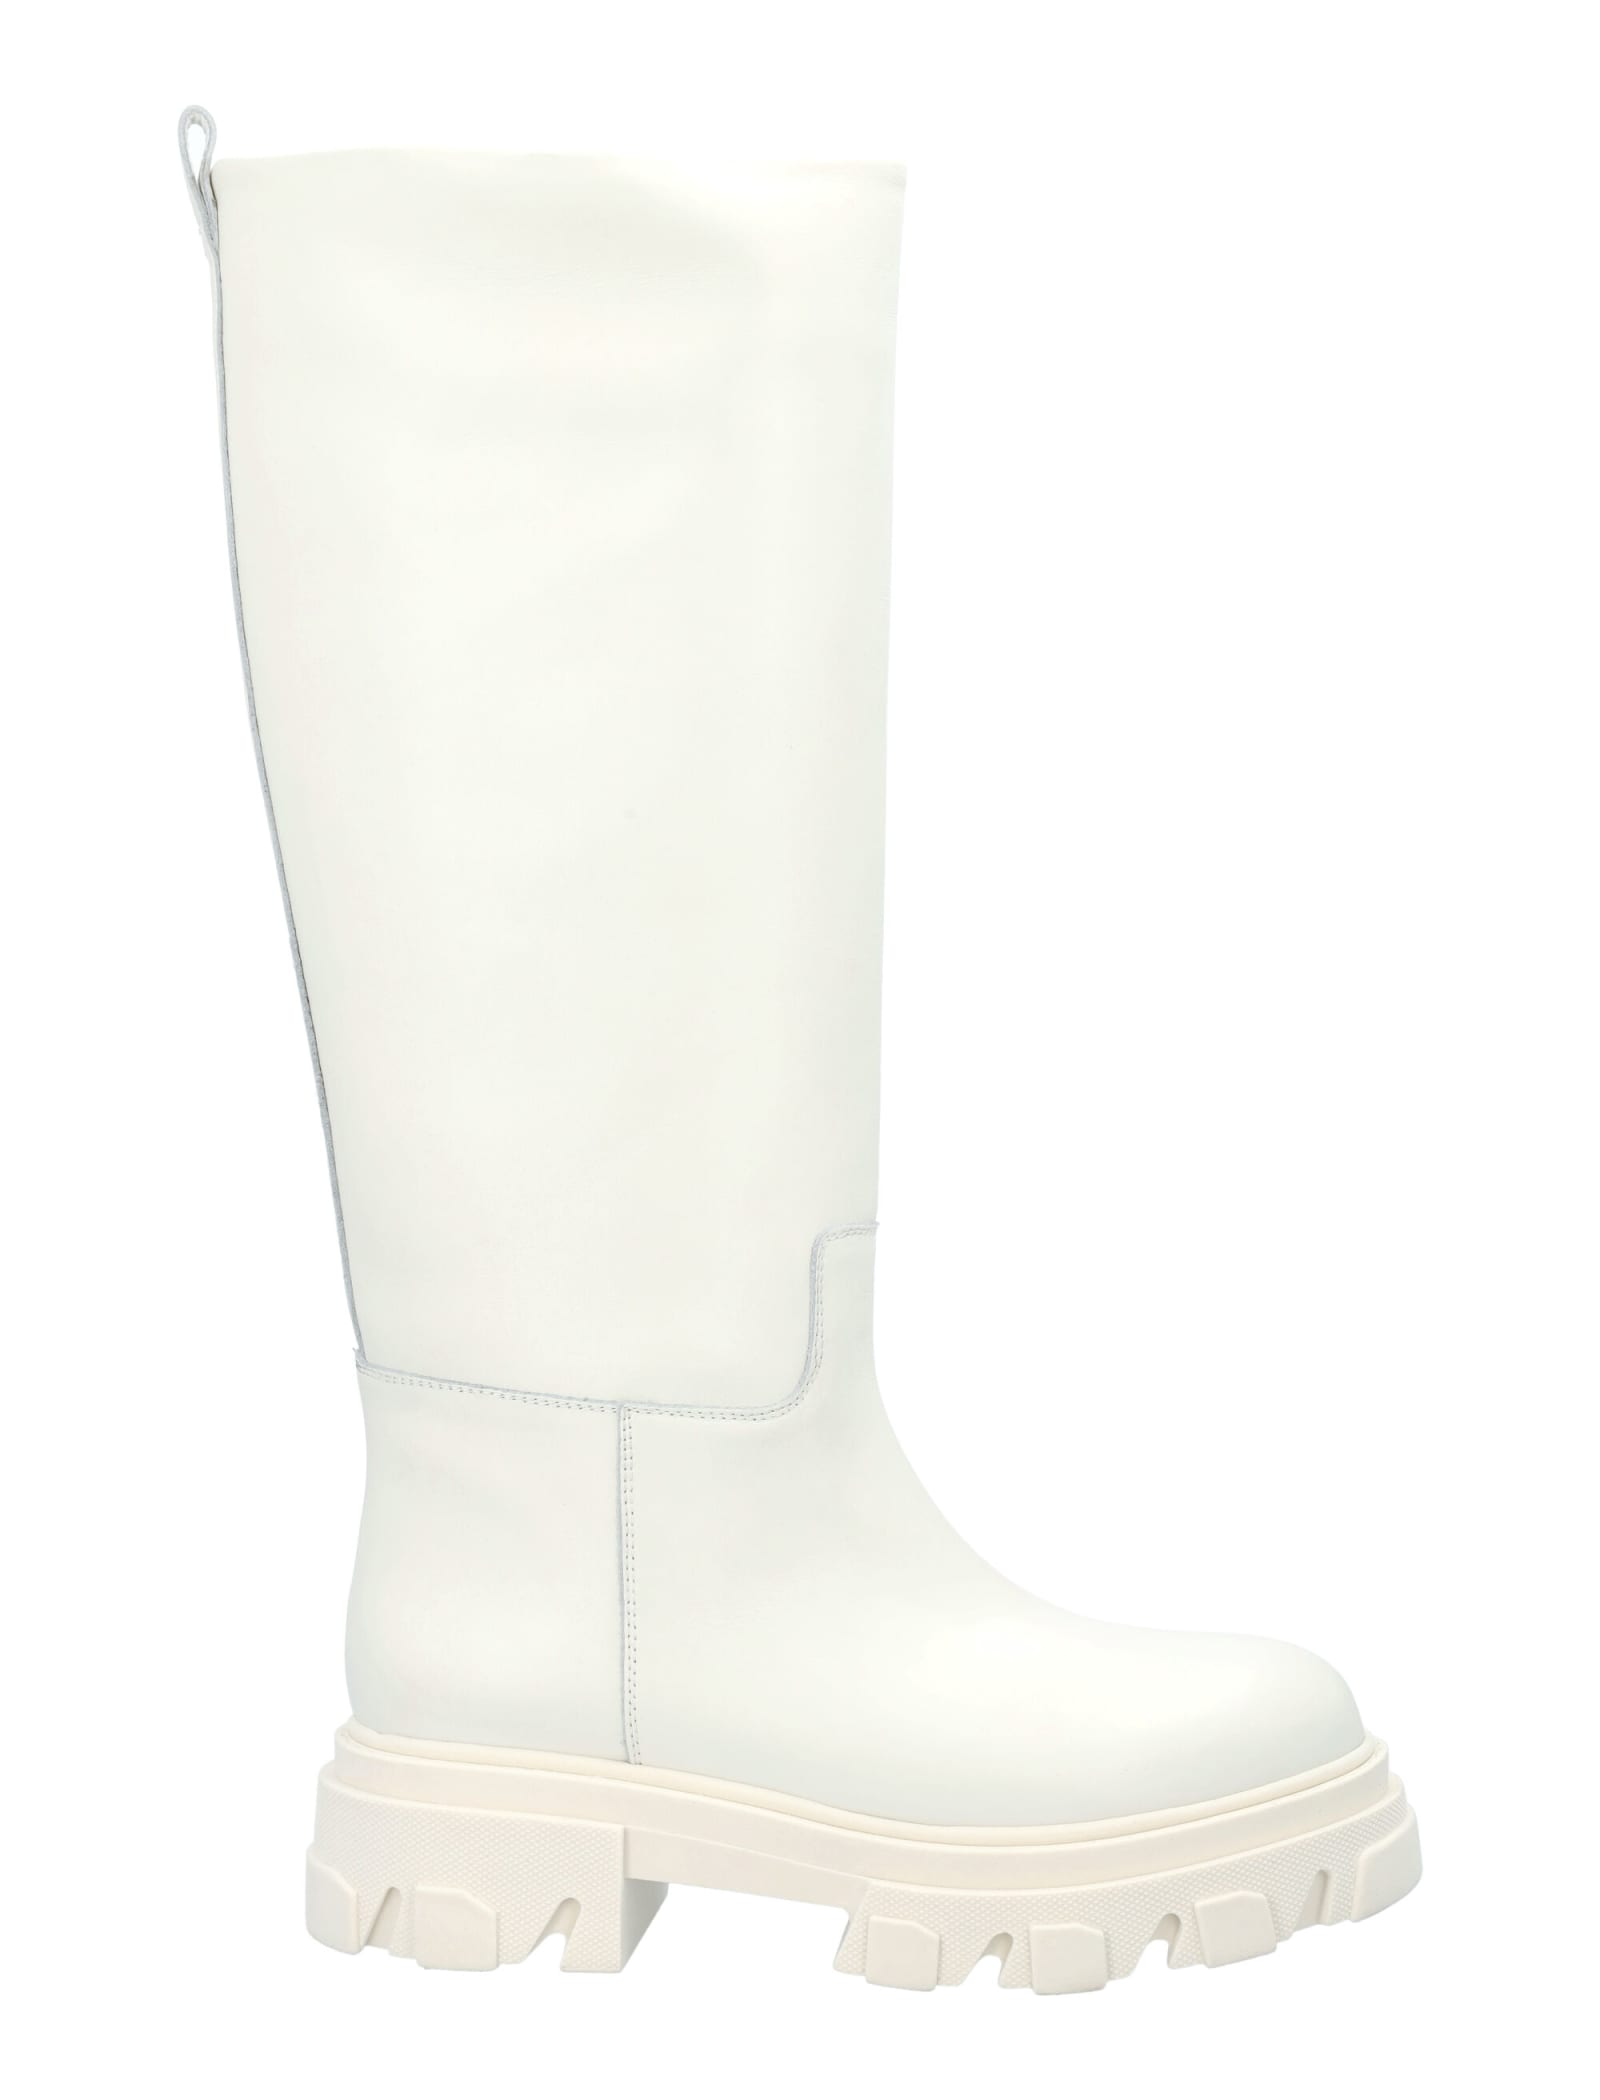 Perni 07 Combat Boot